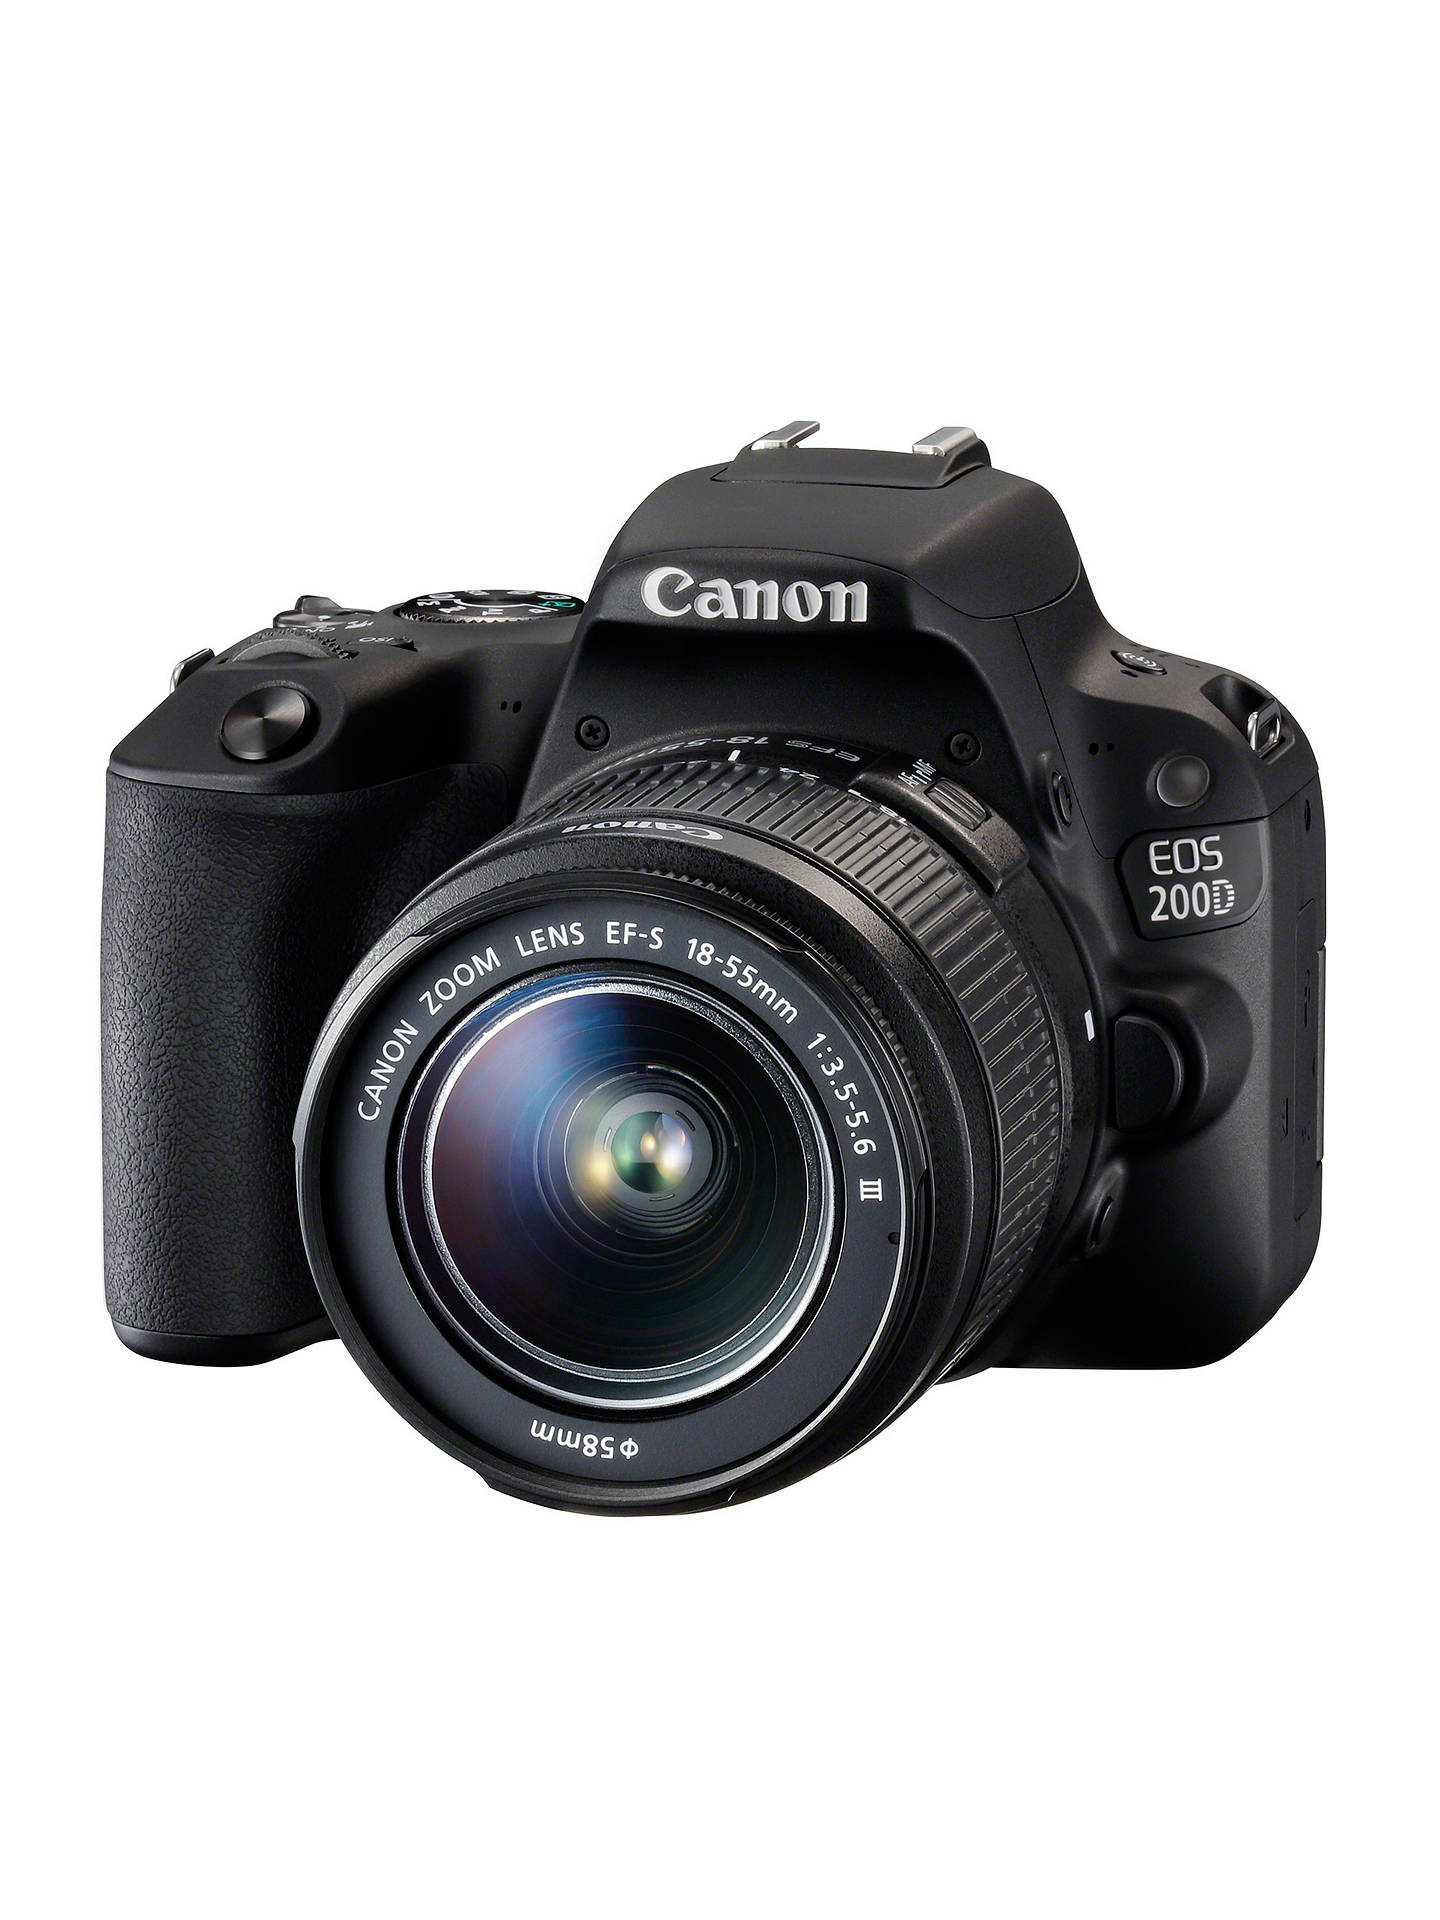 Canon Eos 200d Digital Slr Camera With 18 55mm F 35 56 Iii Lens Flex Flexy Flexyble Aperture 55 Is Buycanon